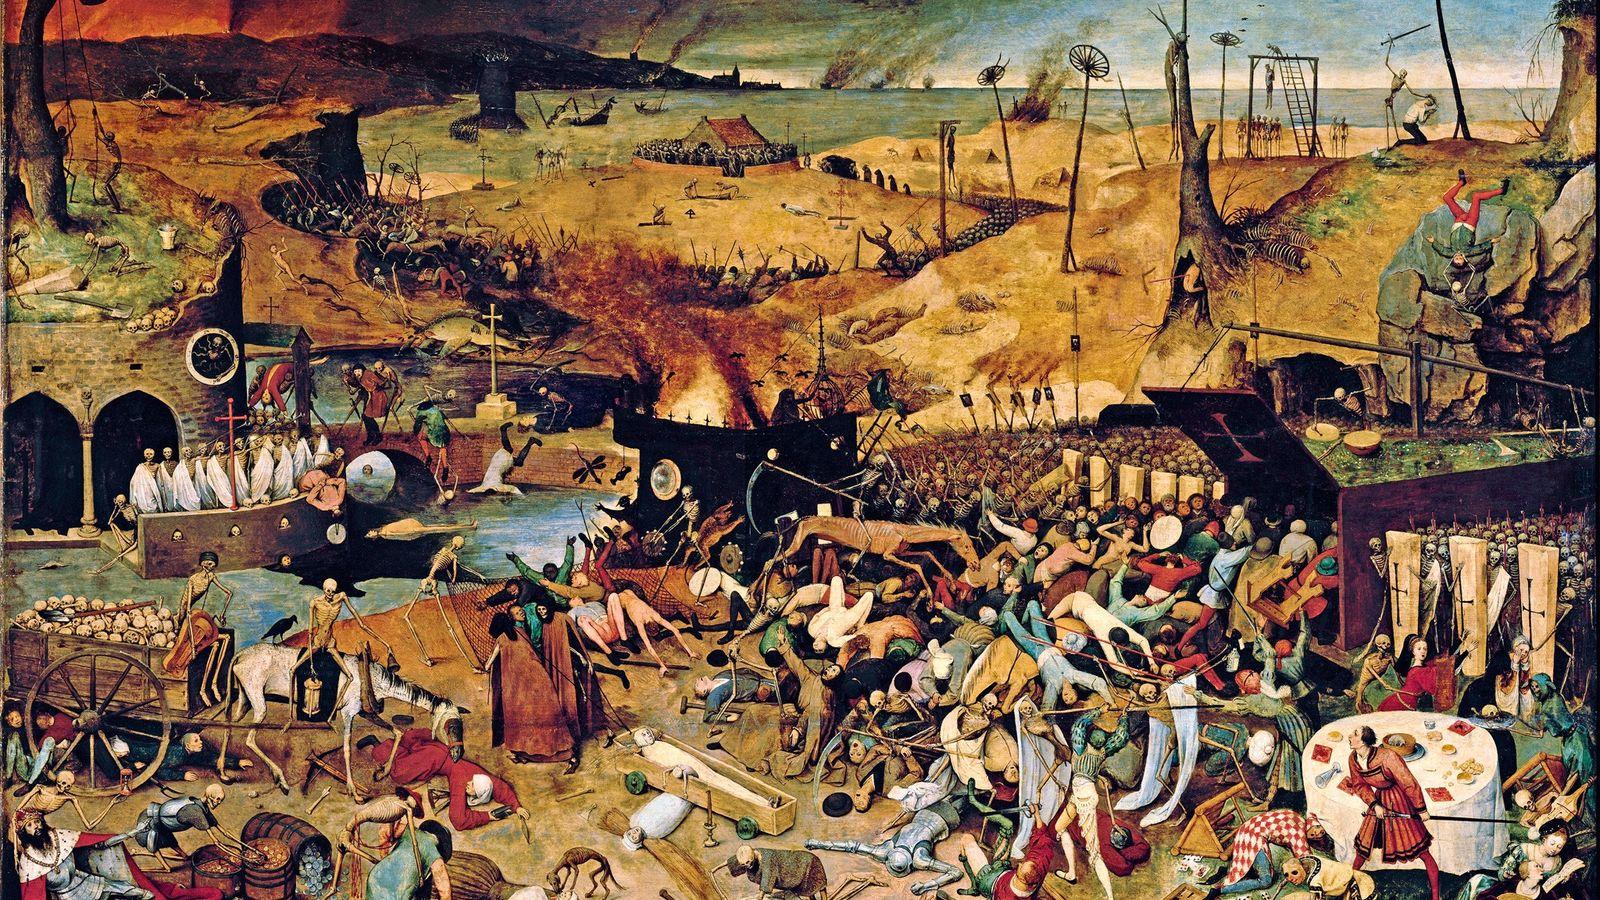 Ce tableau de 1562, « Le triomphe de la mort », de Pieter Bruegel l'Ancien, illustre ...